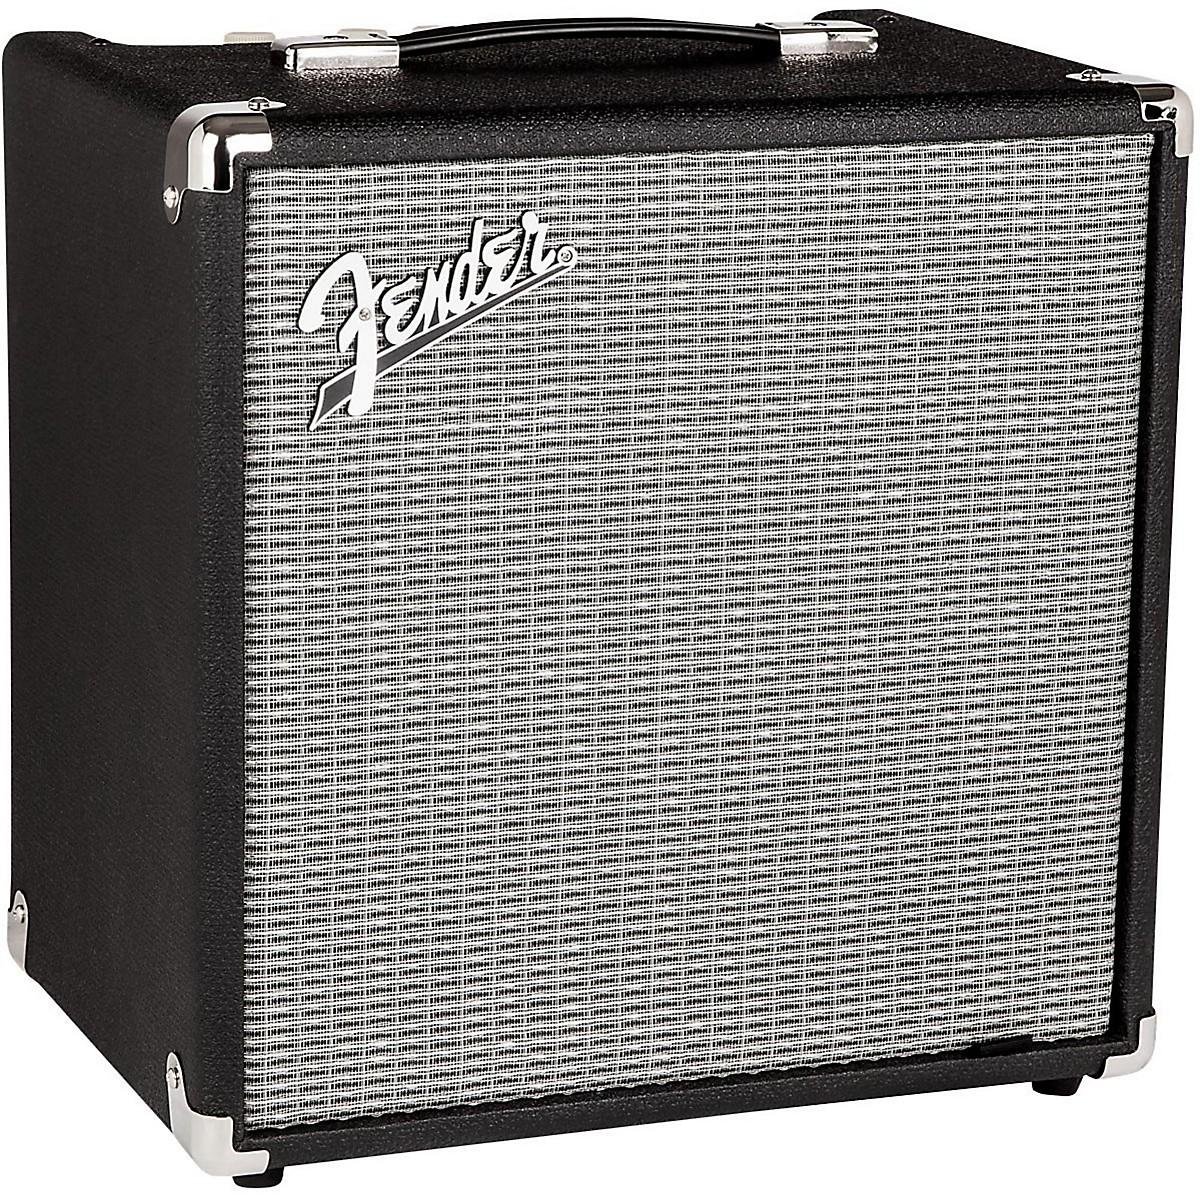 Fender RUMBLE 25 1x8 25W Bass Combo Amp